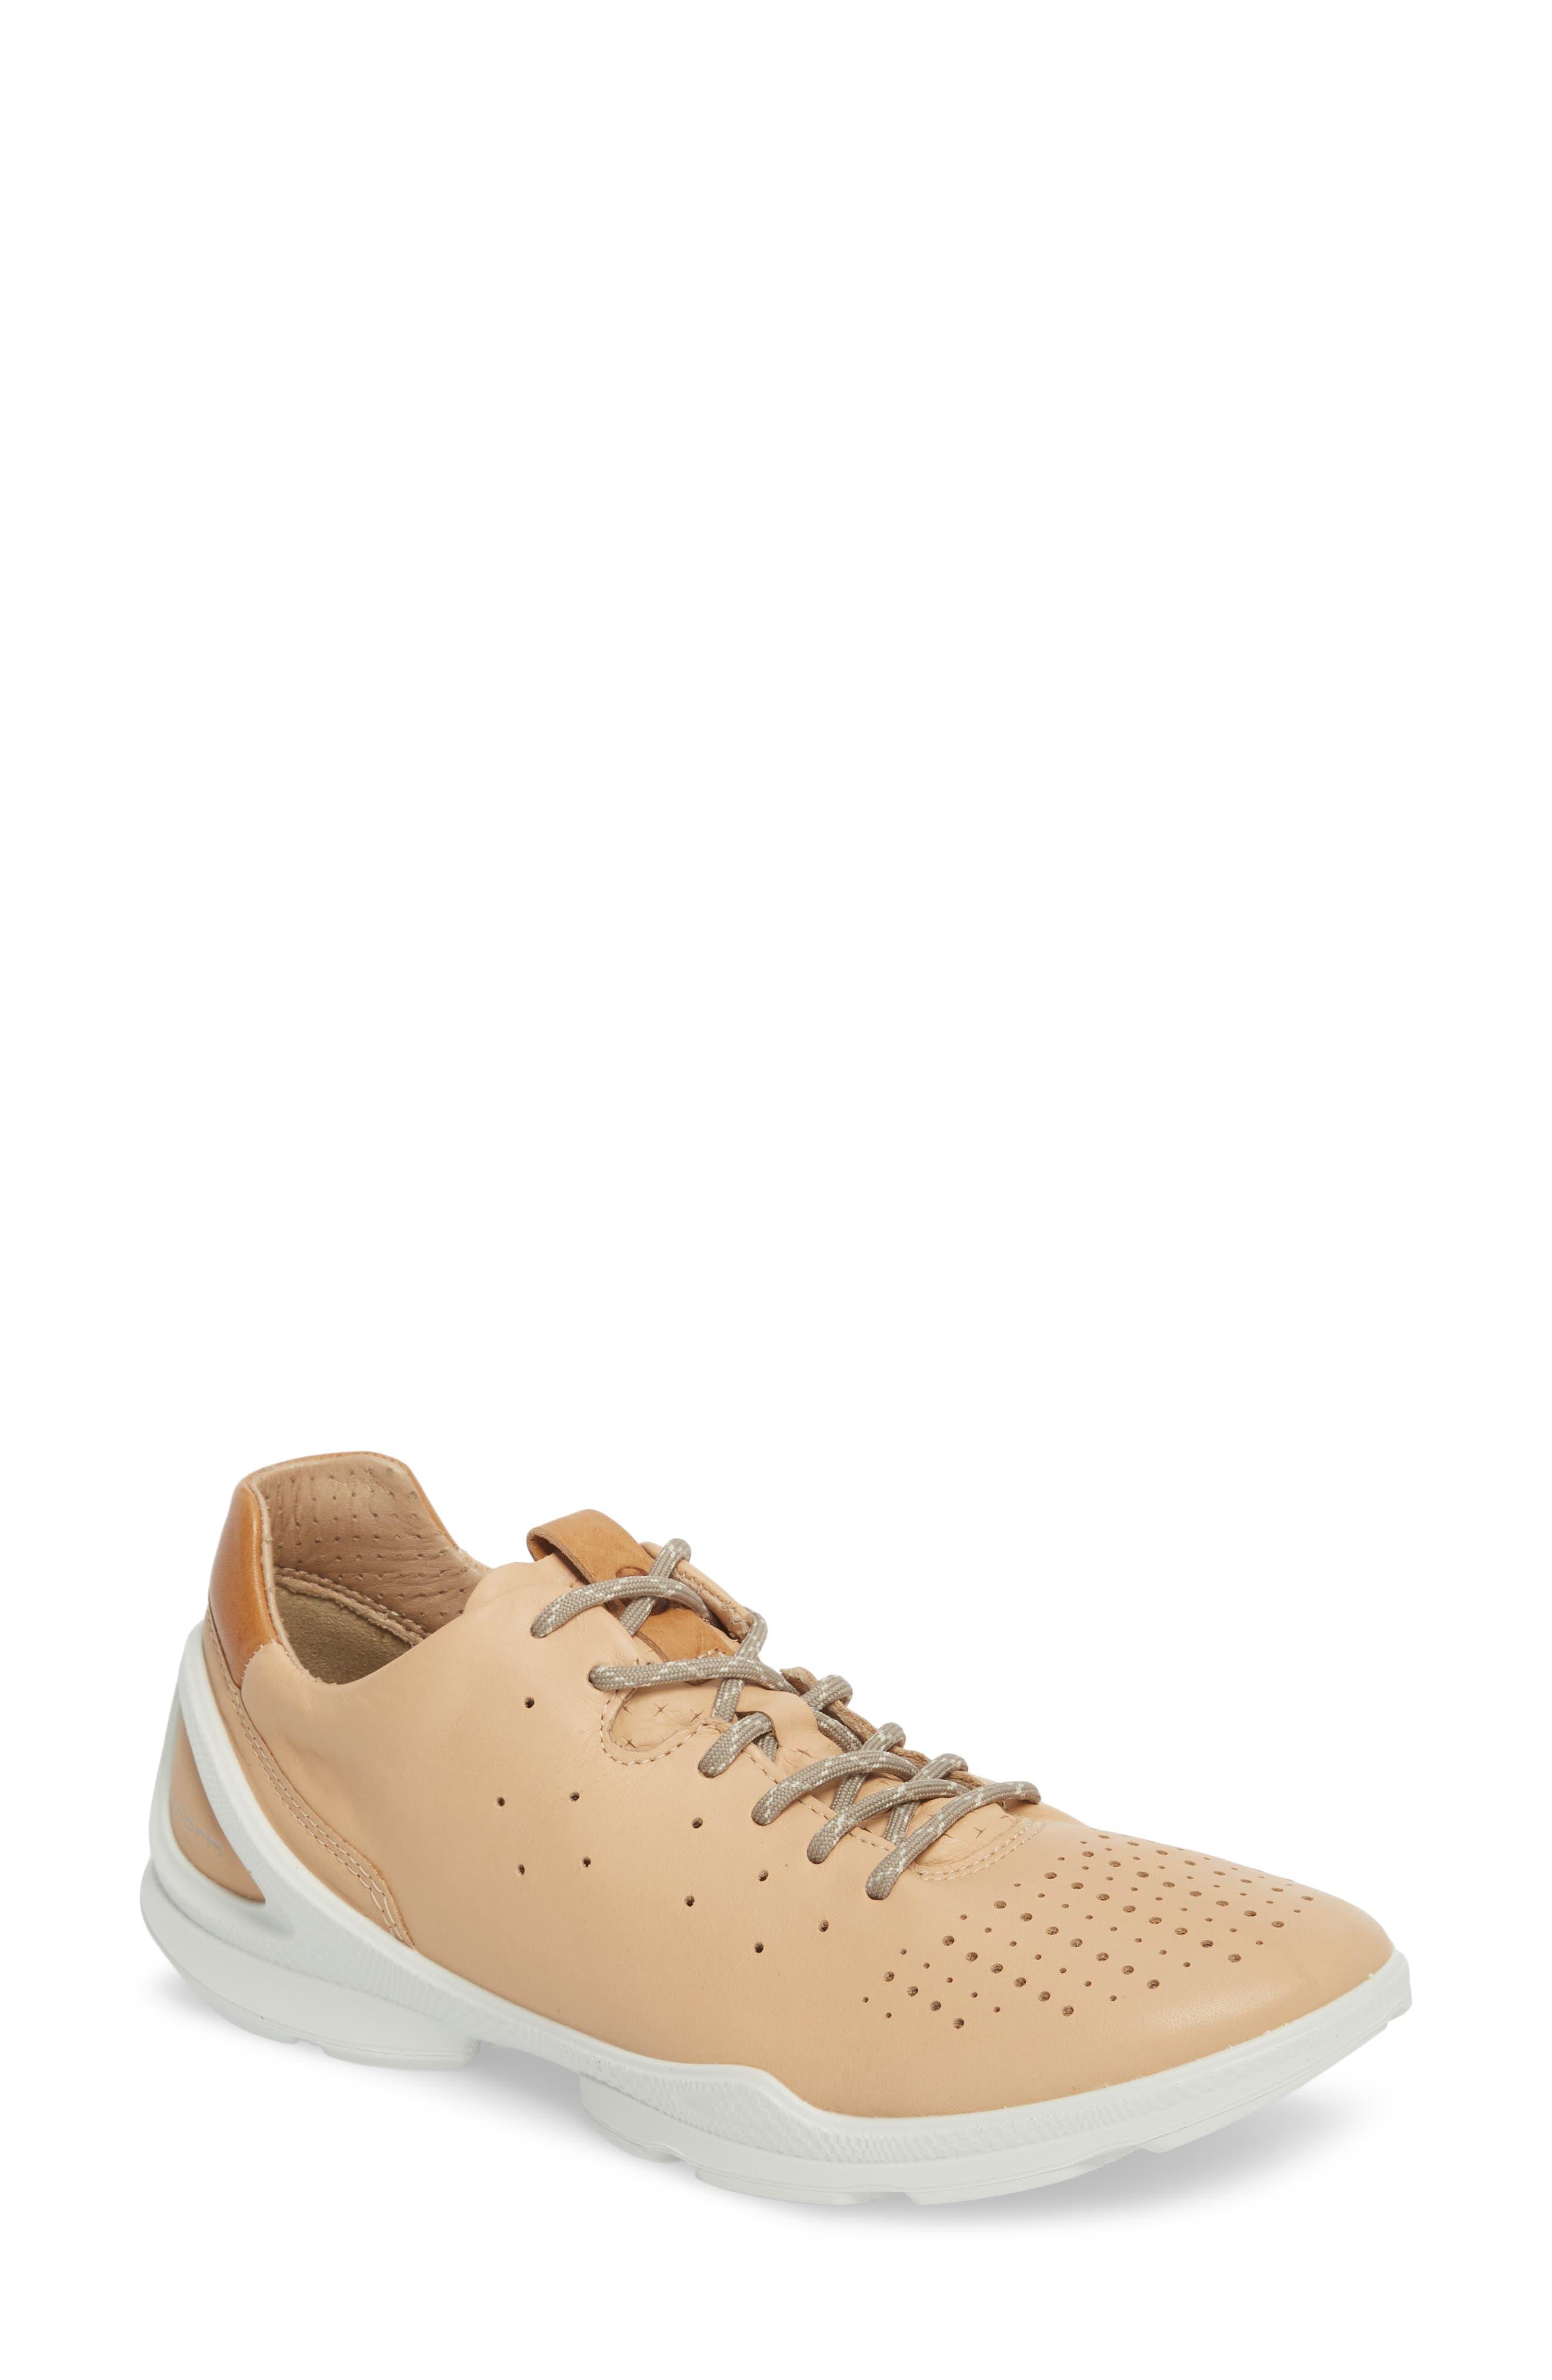 Biom Street Sneaker,                         Main,                         color, Powder Leather